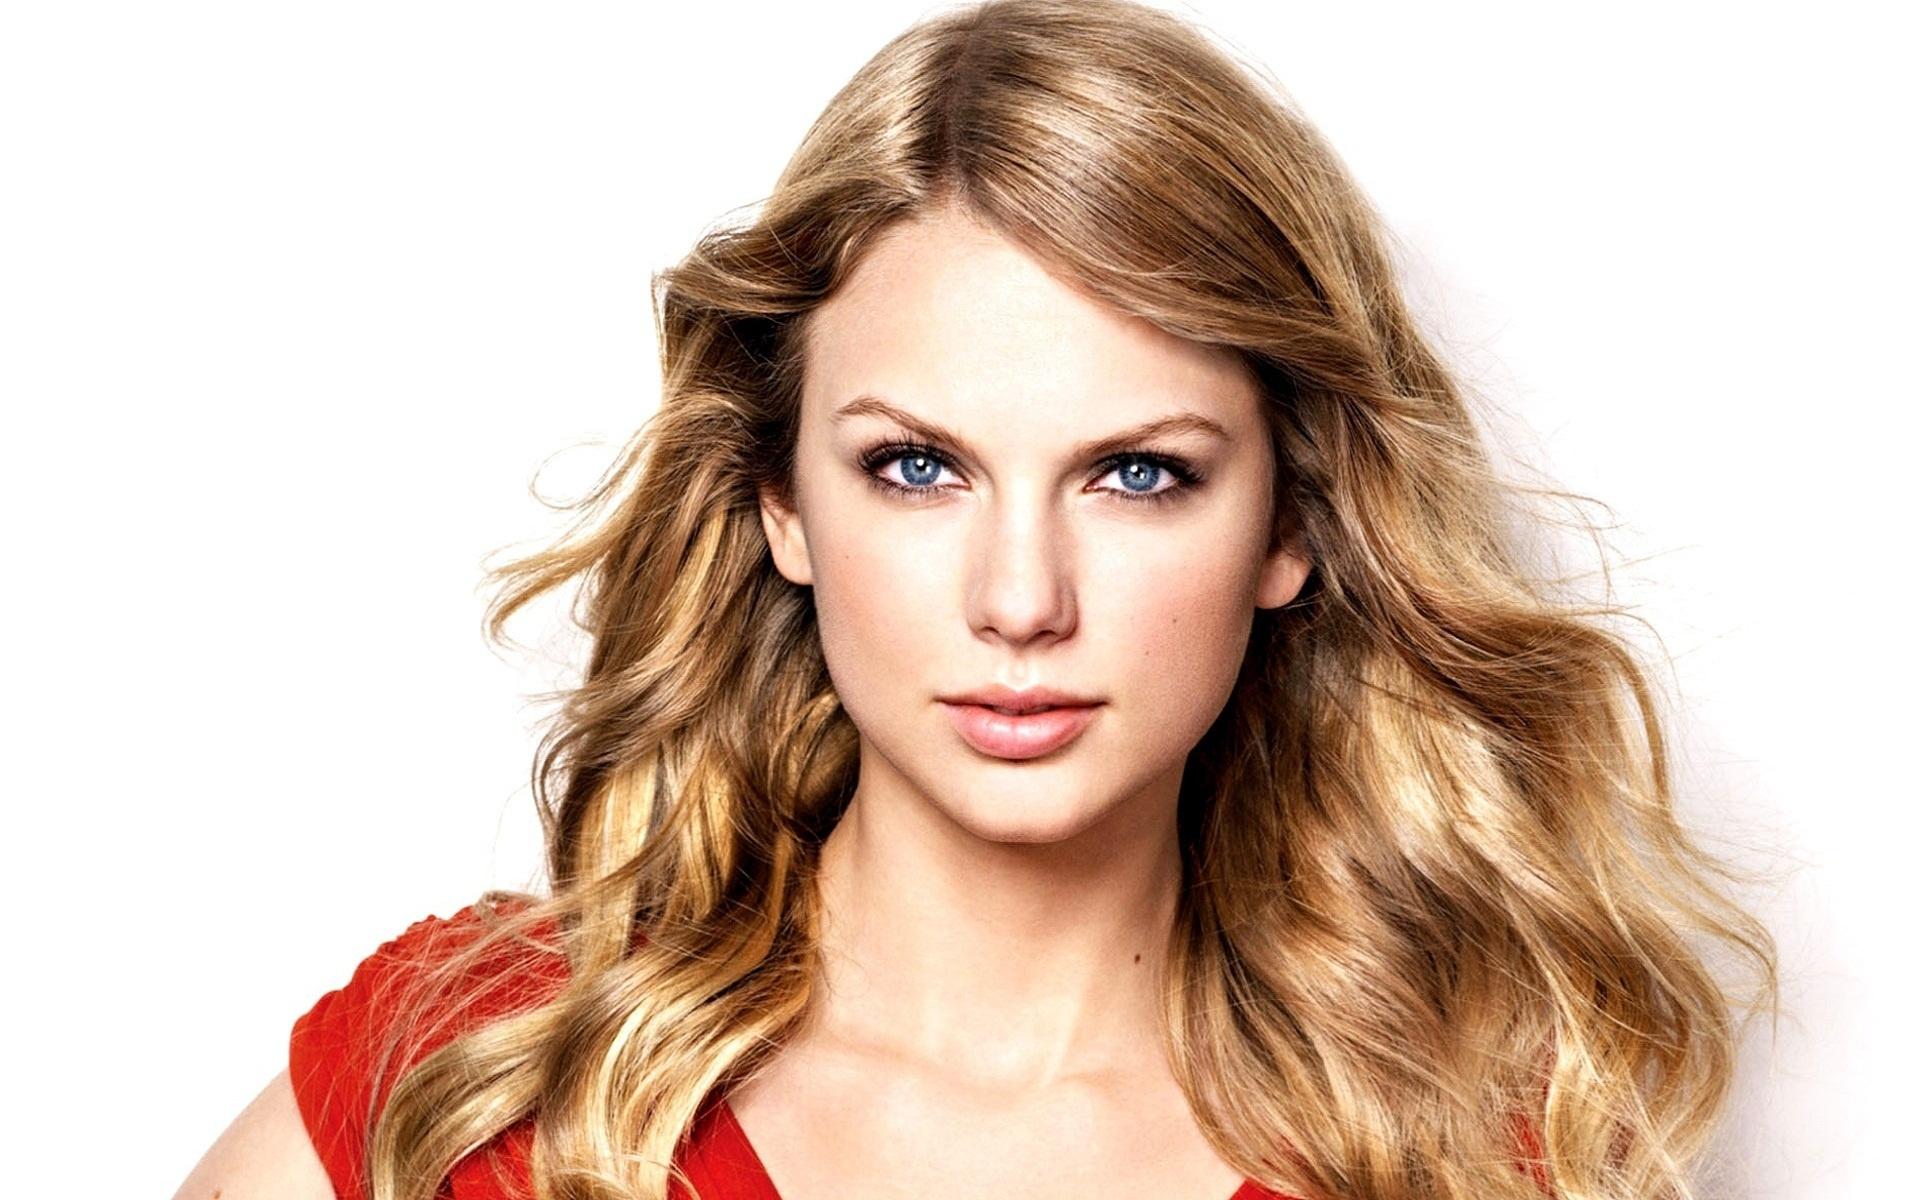 Taylor Swift Widescreen